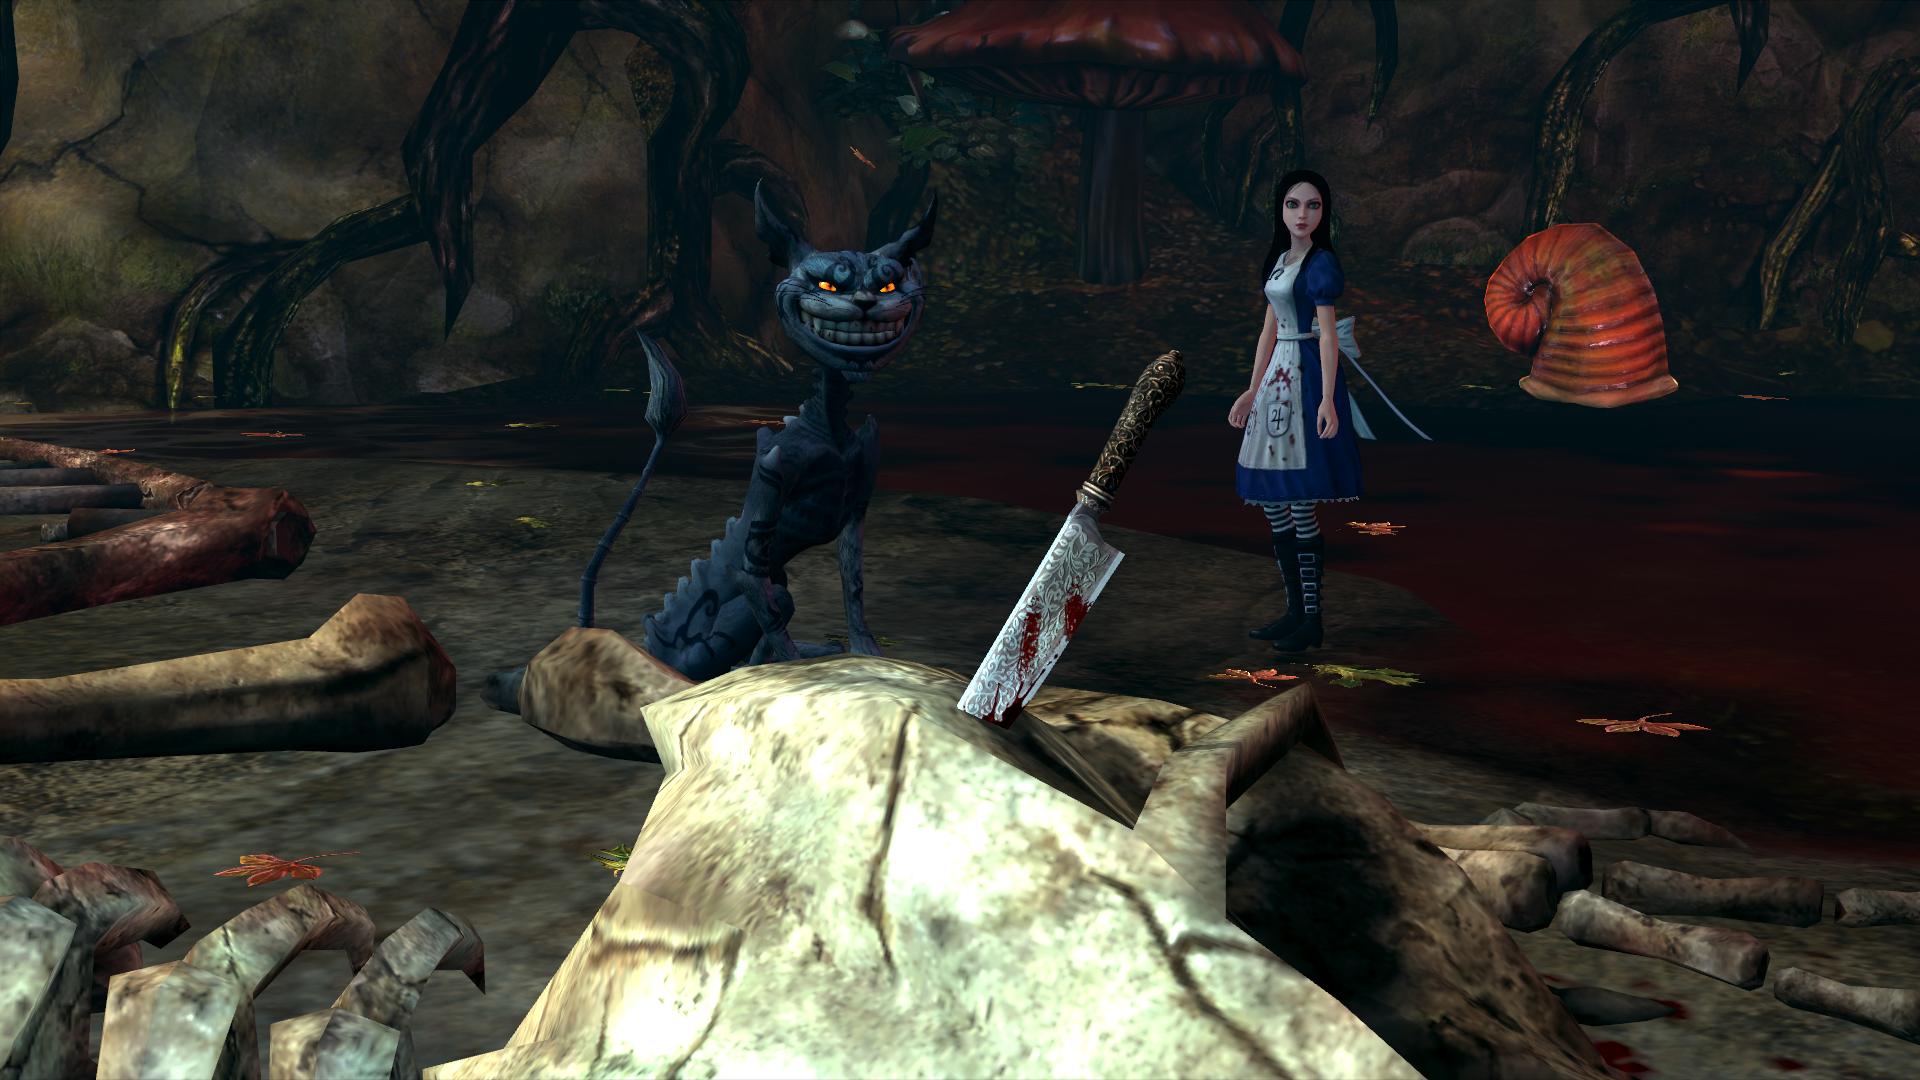 La espada Vorpal en el esqueleto.png